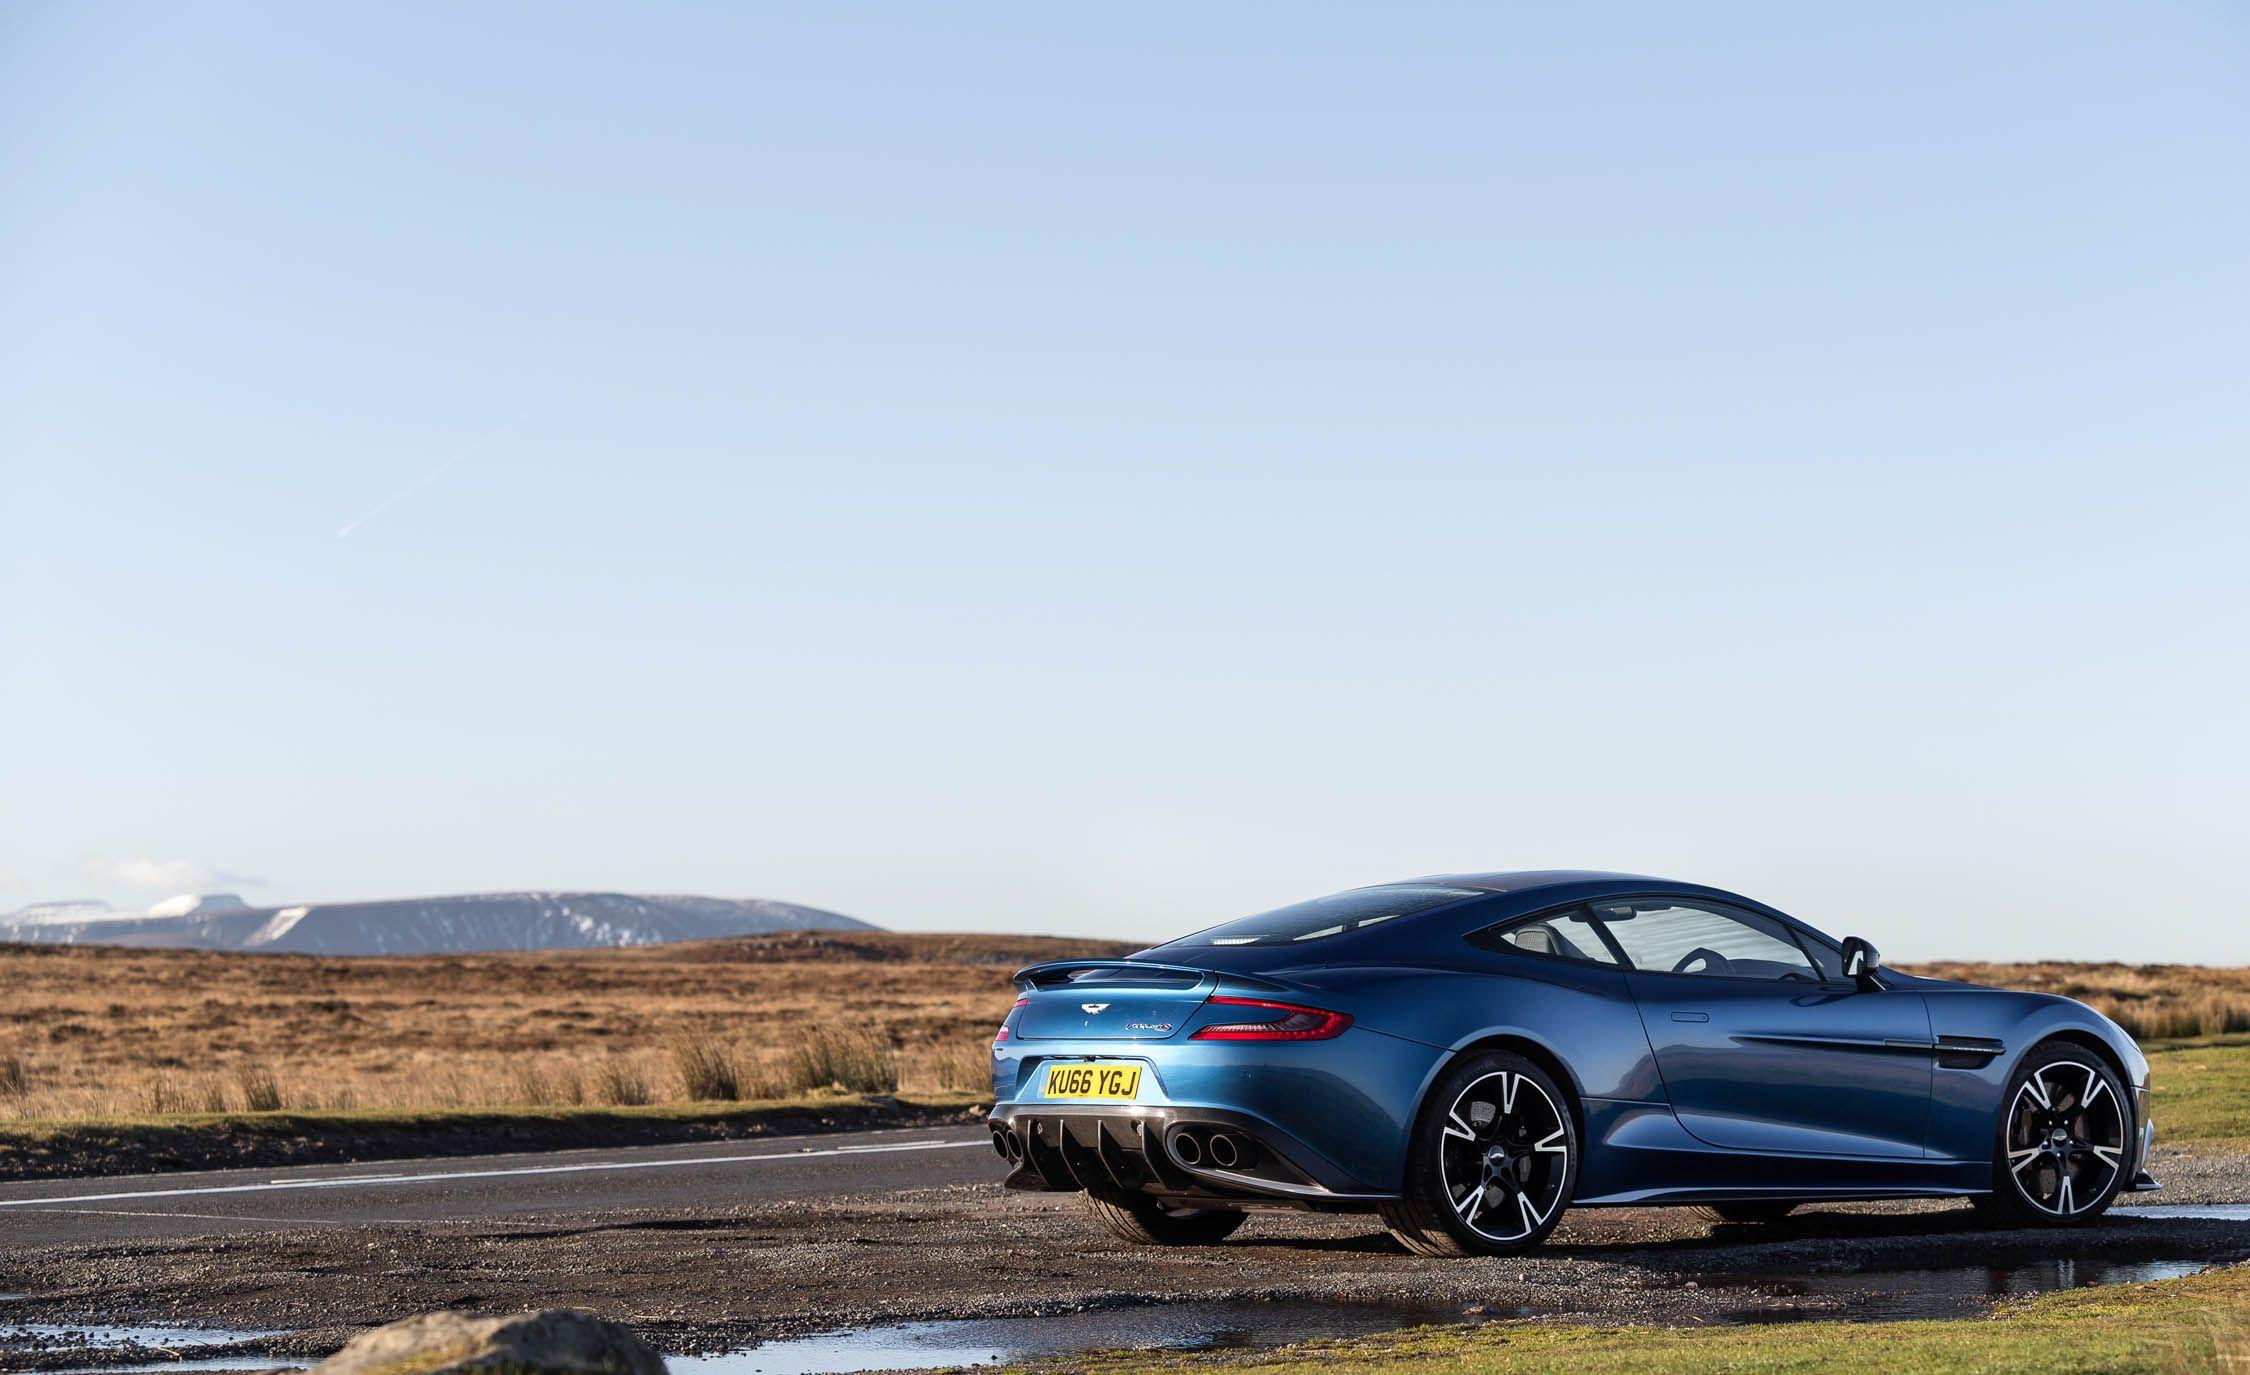 Aston Martin Vanquish Reviews Aston Martin Vanquish Price Photos